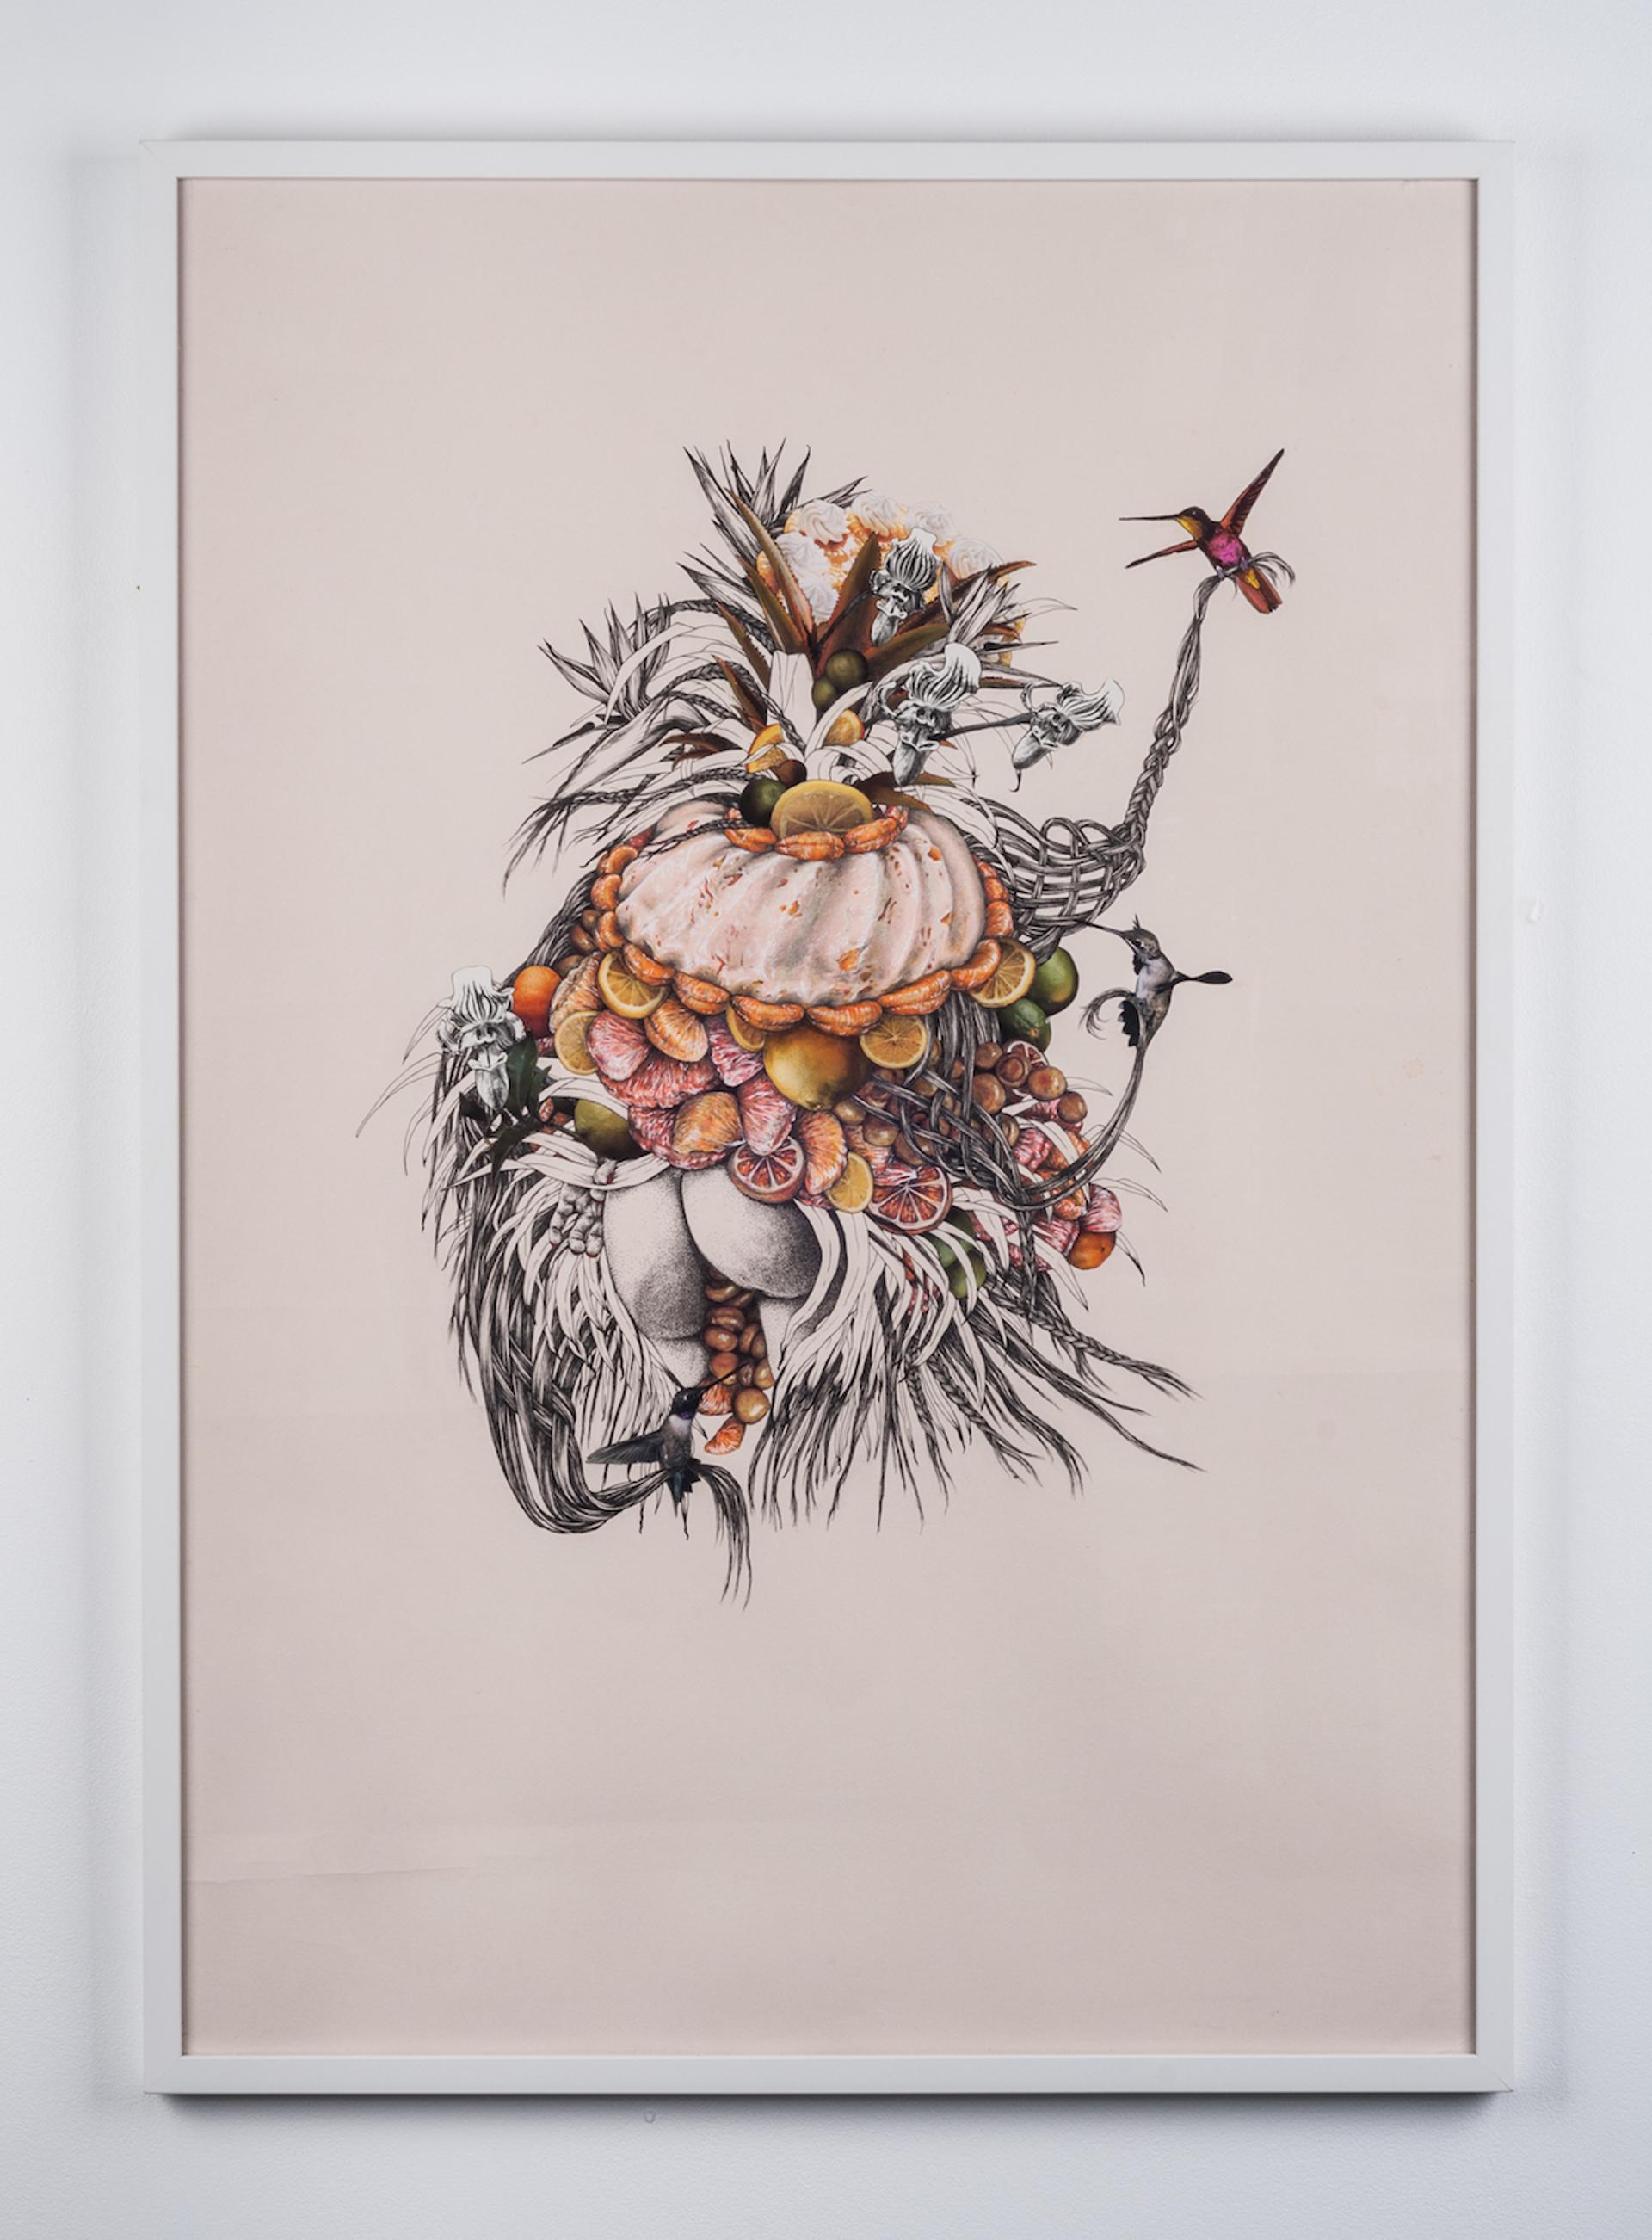 My Citrus Mistress by Morgan Rosskopf